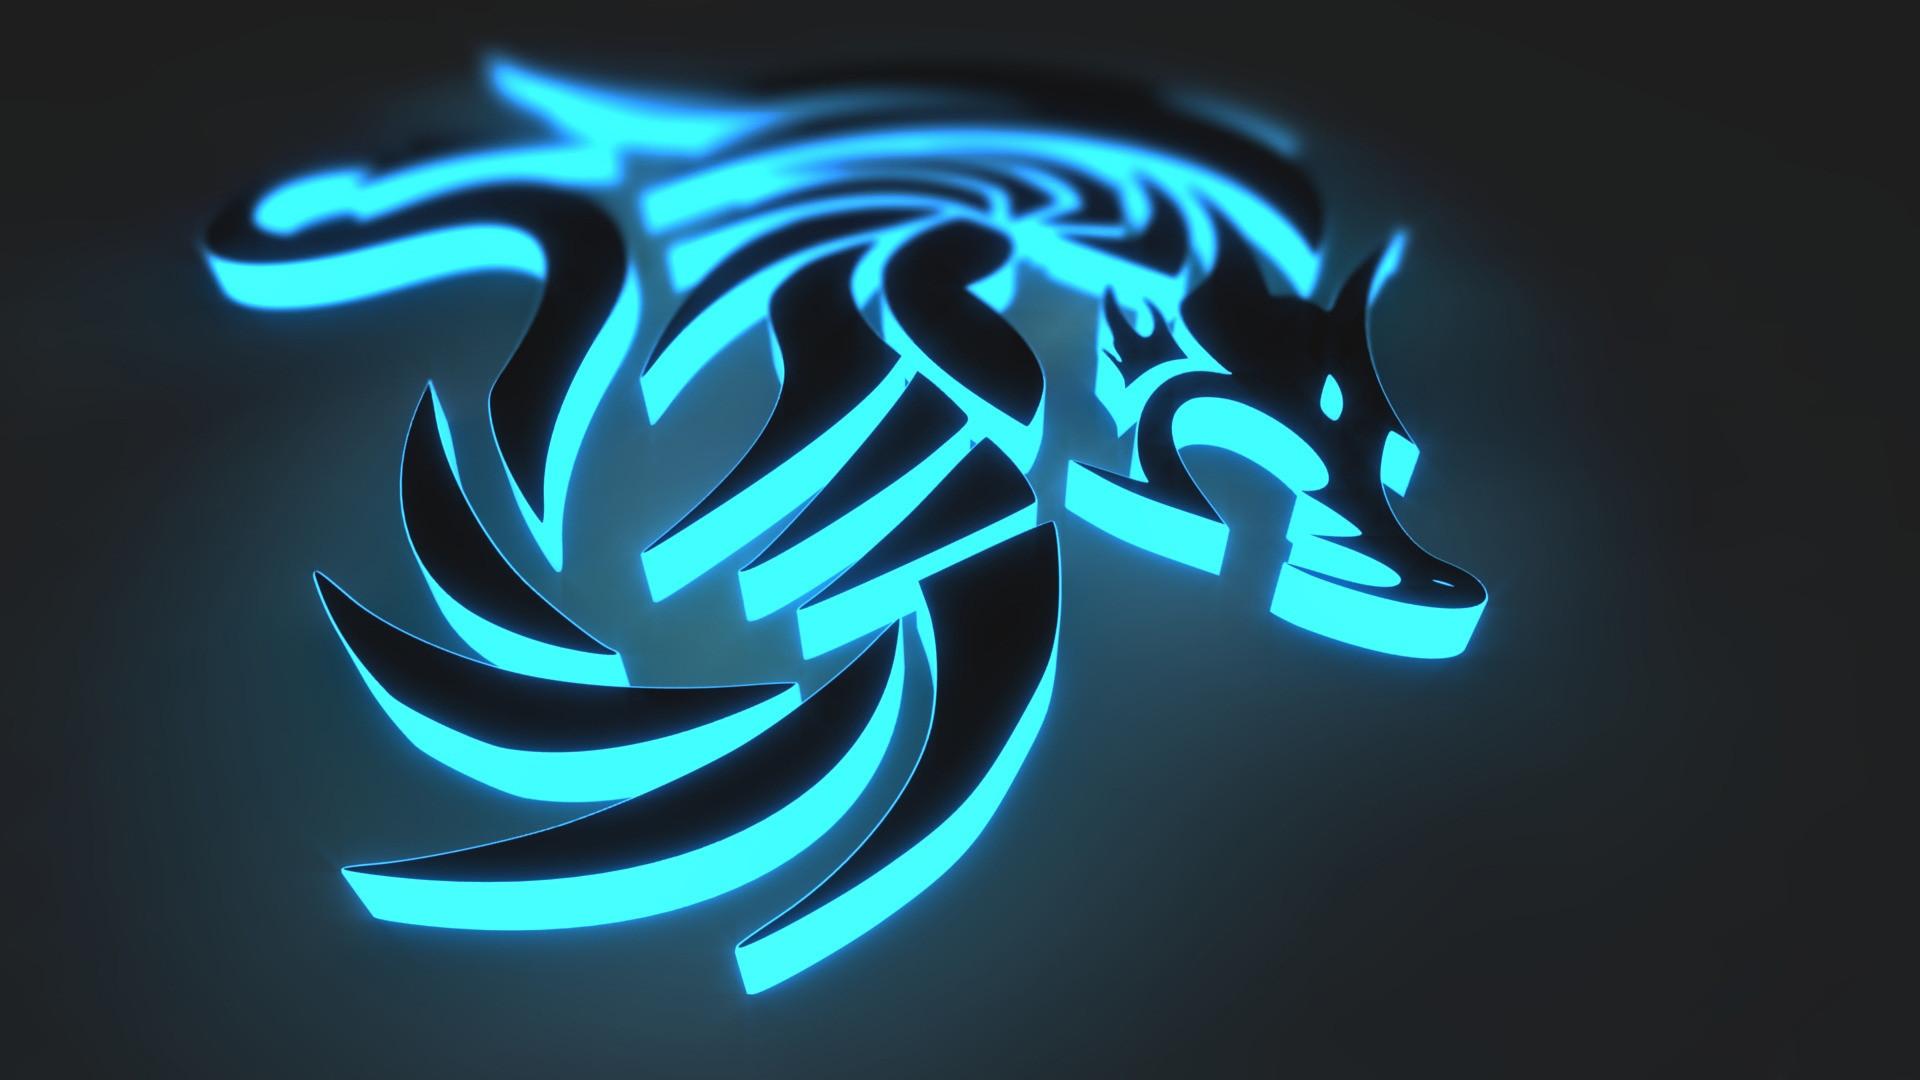 Dragon Wallpapers 3D wallpaper – 654645